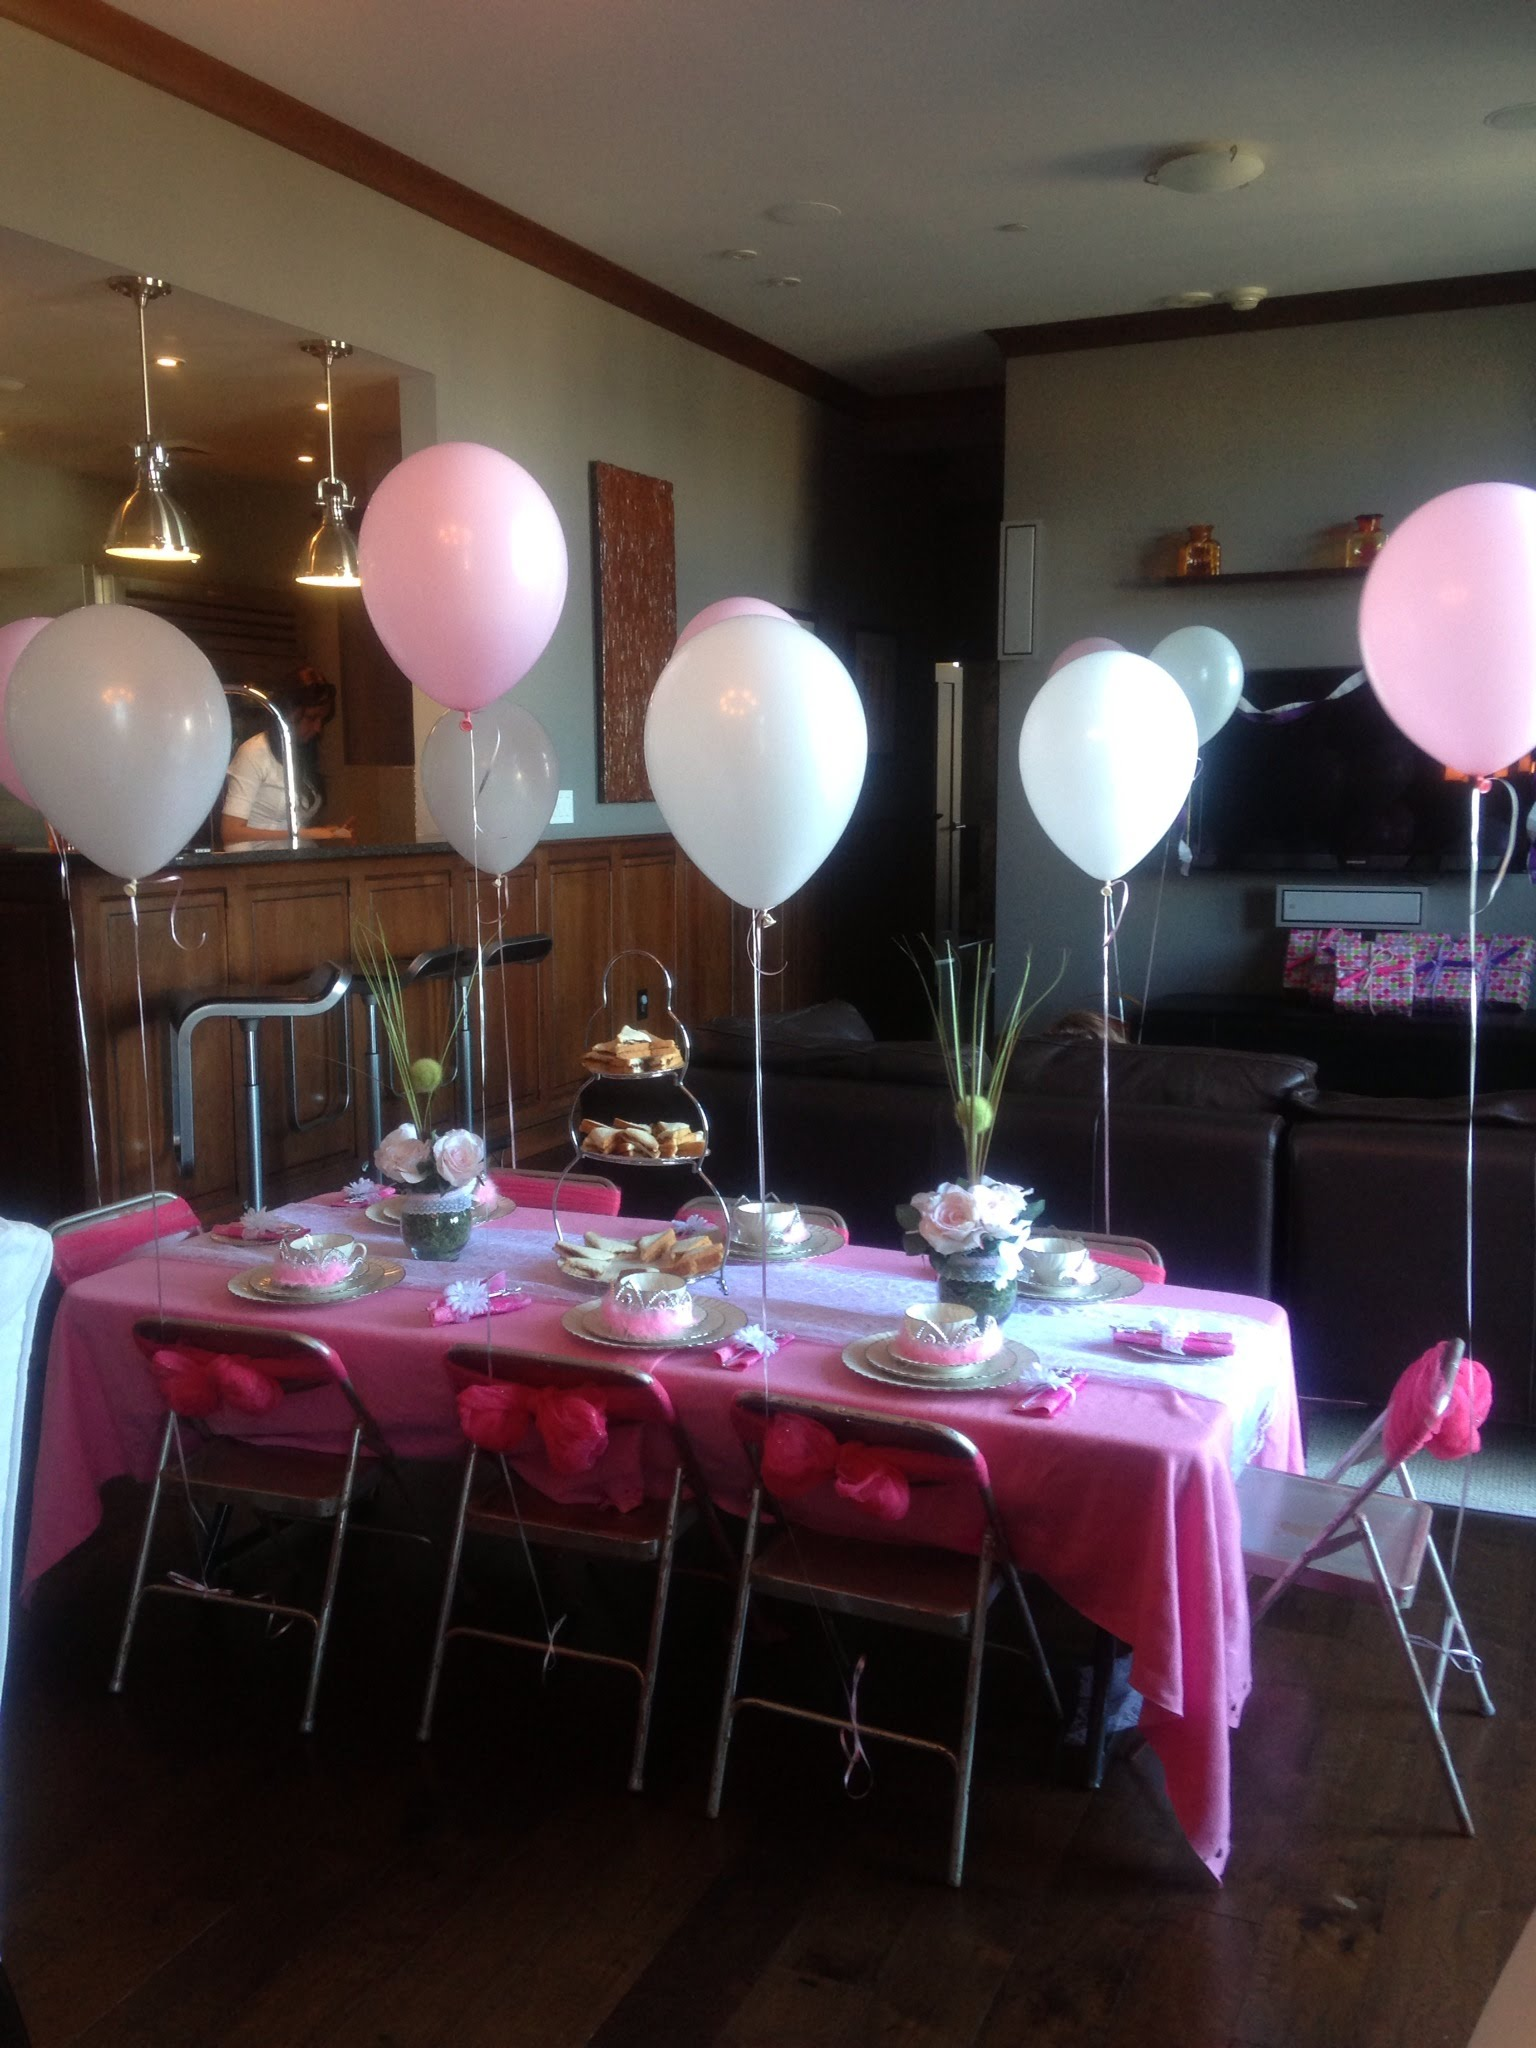 kids character chairs vintage metal chair tea parties nj, spa party philadelphia, entertainment visits ...